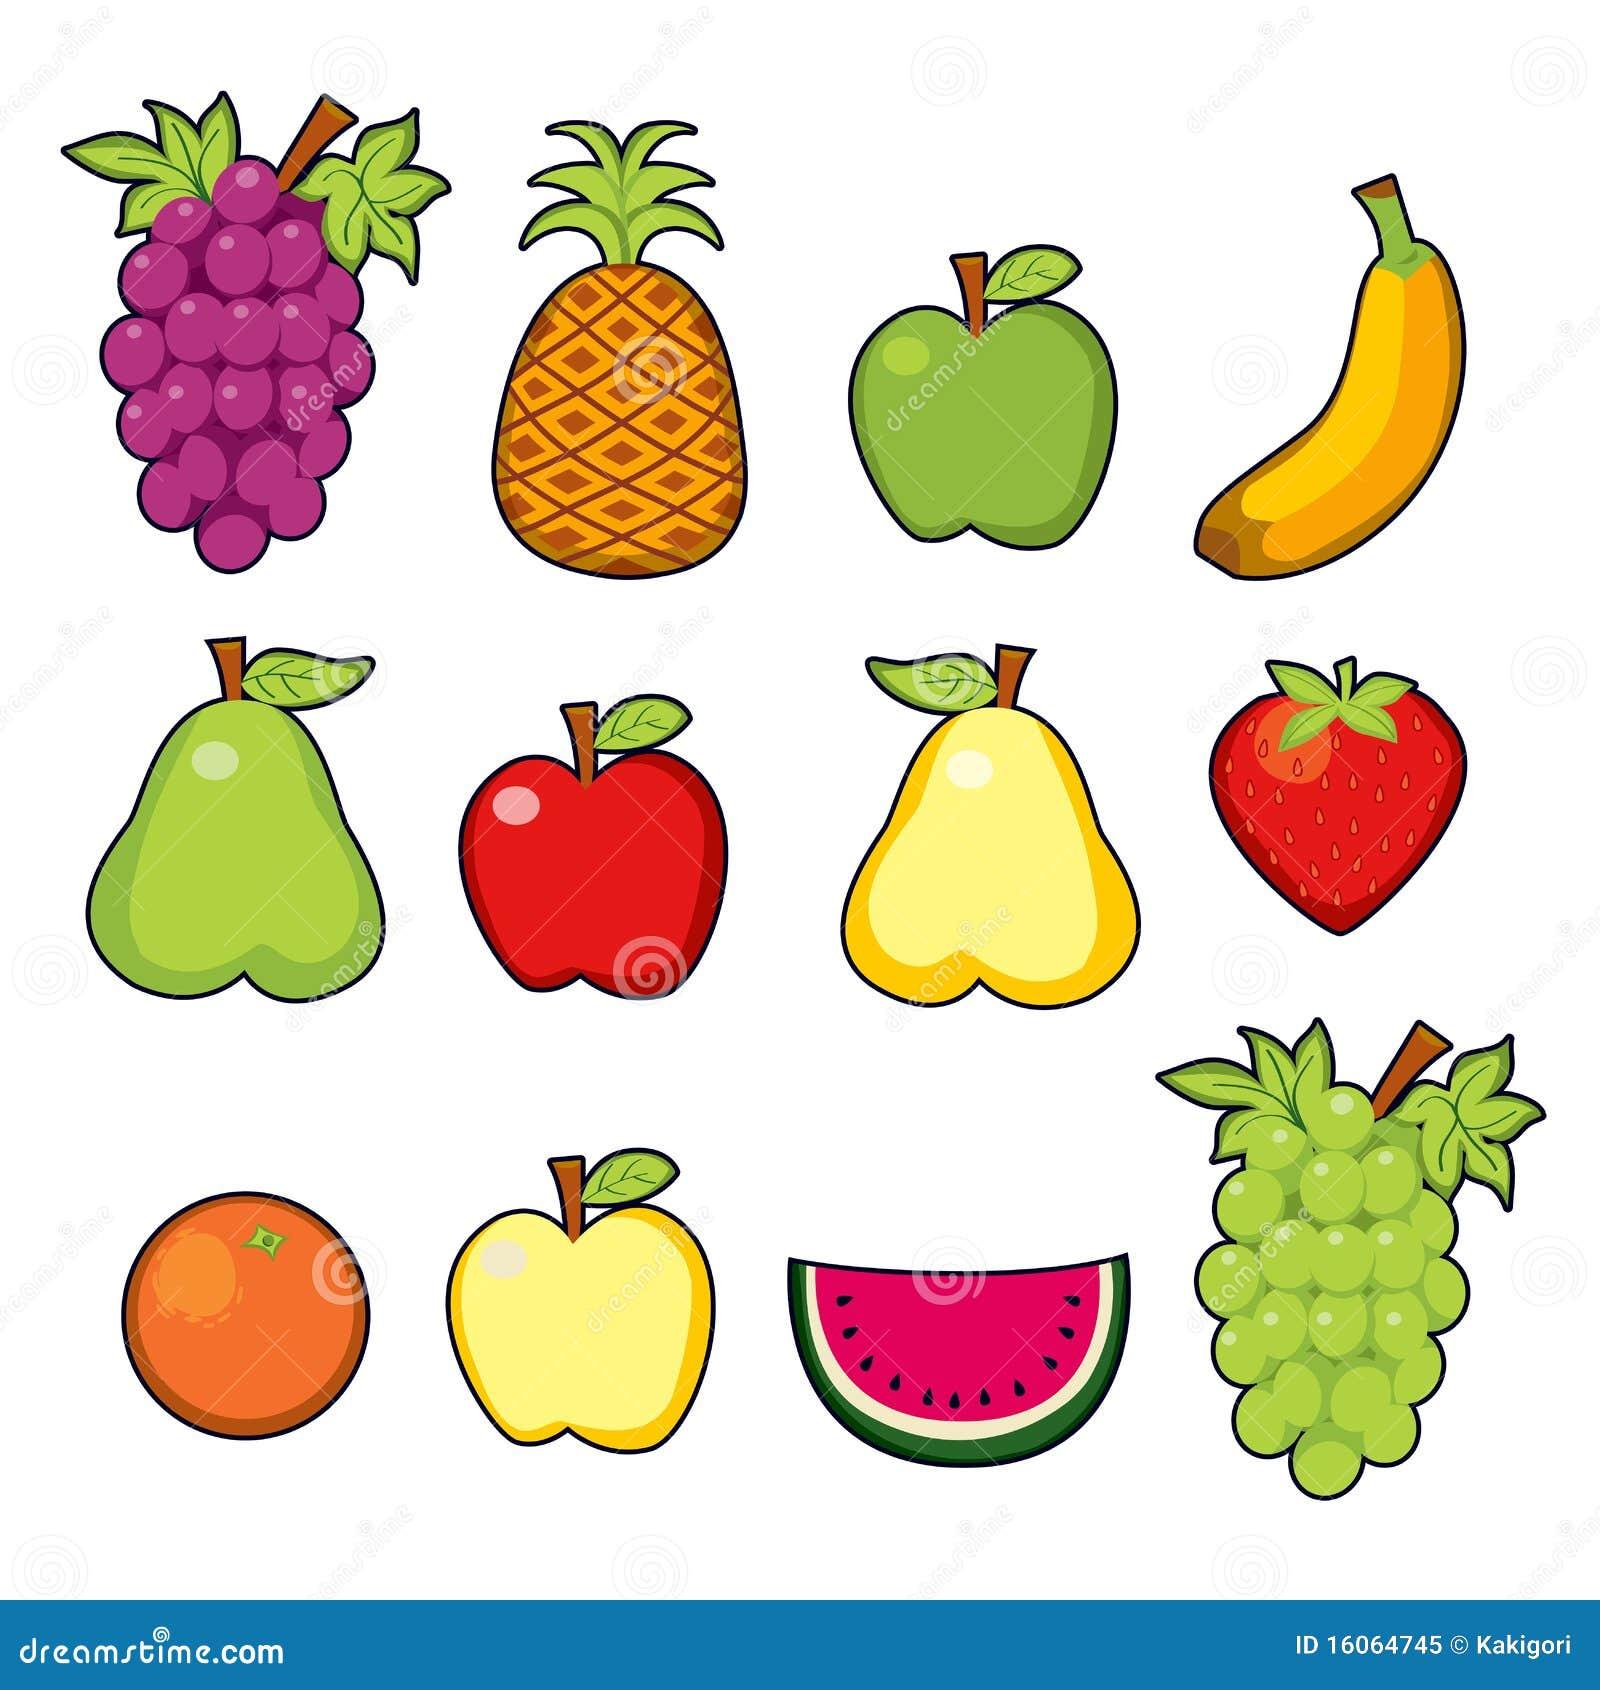 Imagenes de alimentos fotos de alimentos imagenes animadas - Fotos de comodas ...